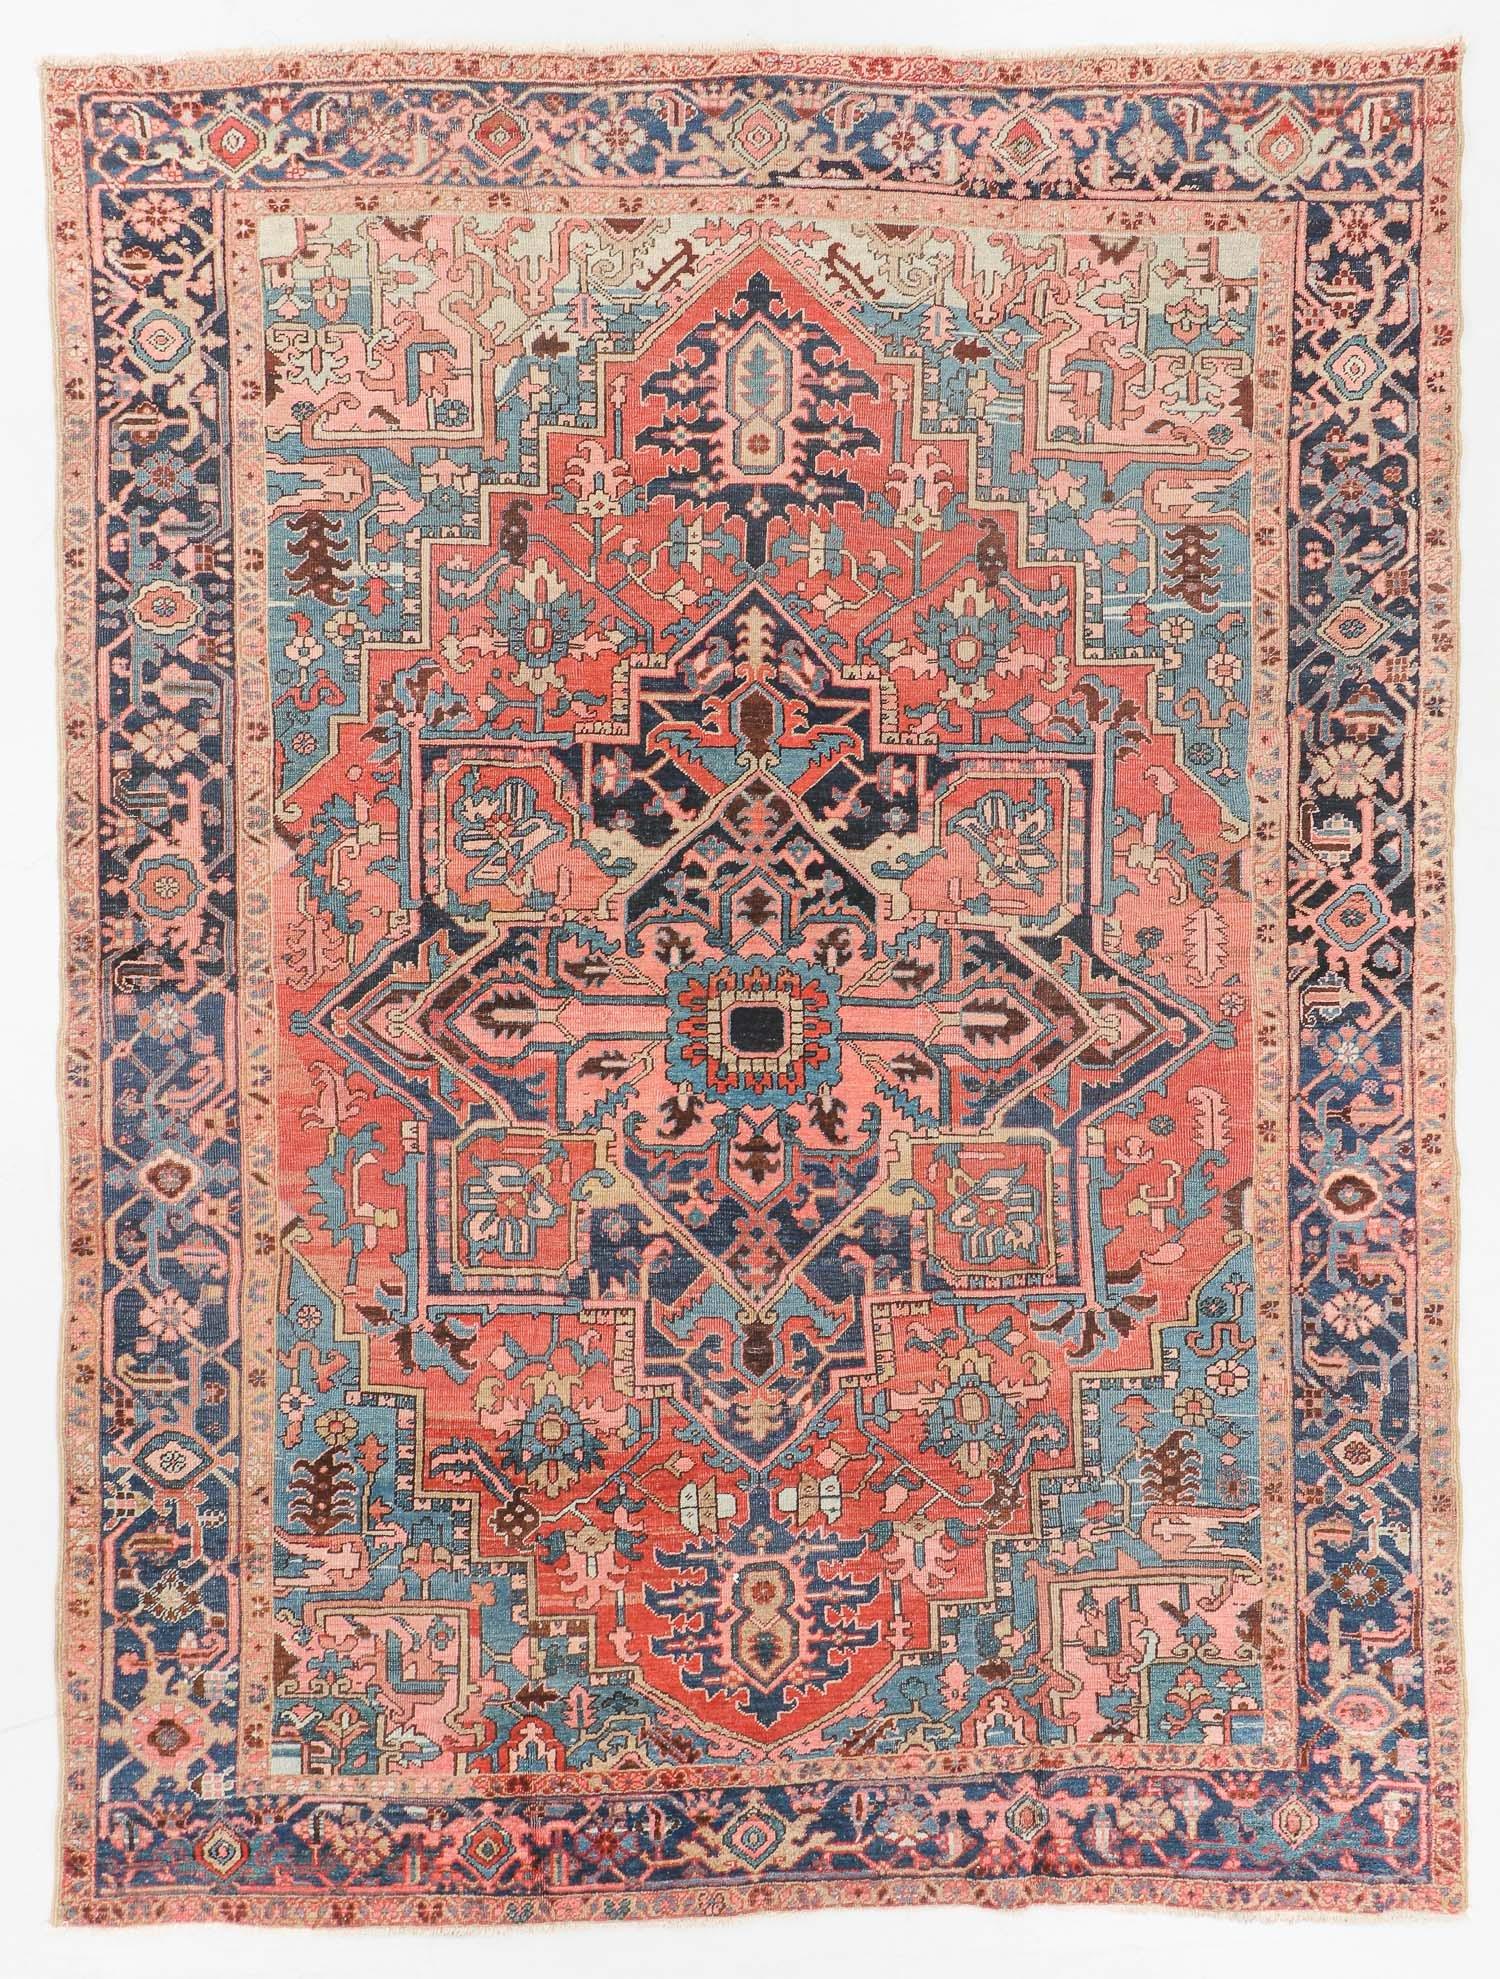 Antique Heriz Rug, Persia: 8'10'' x 11'6''